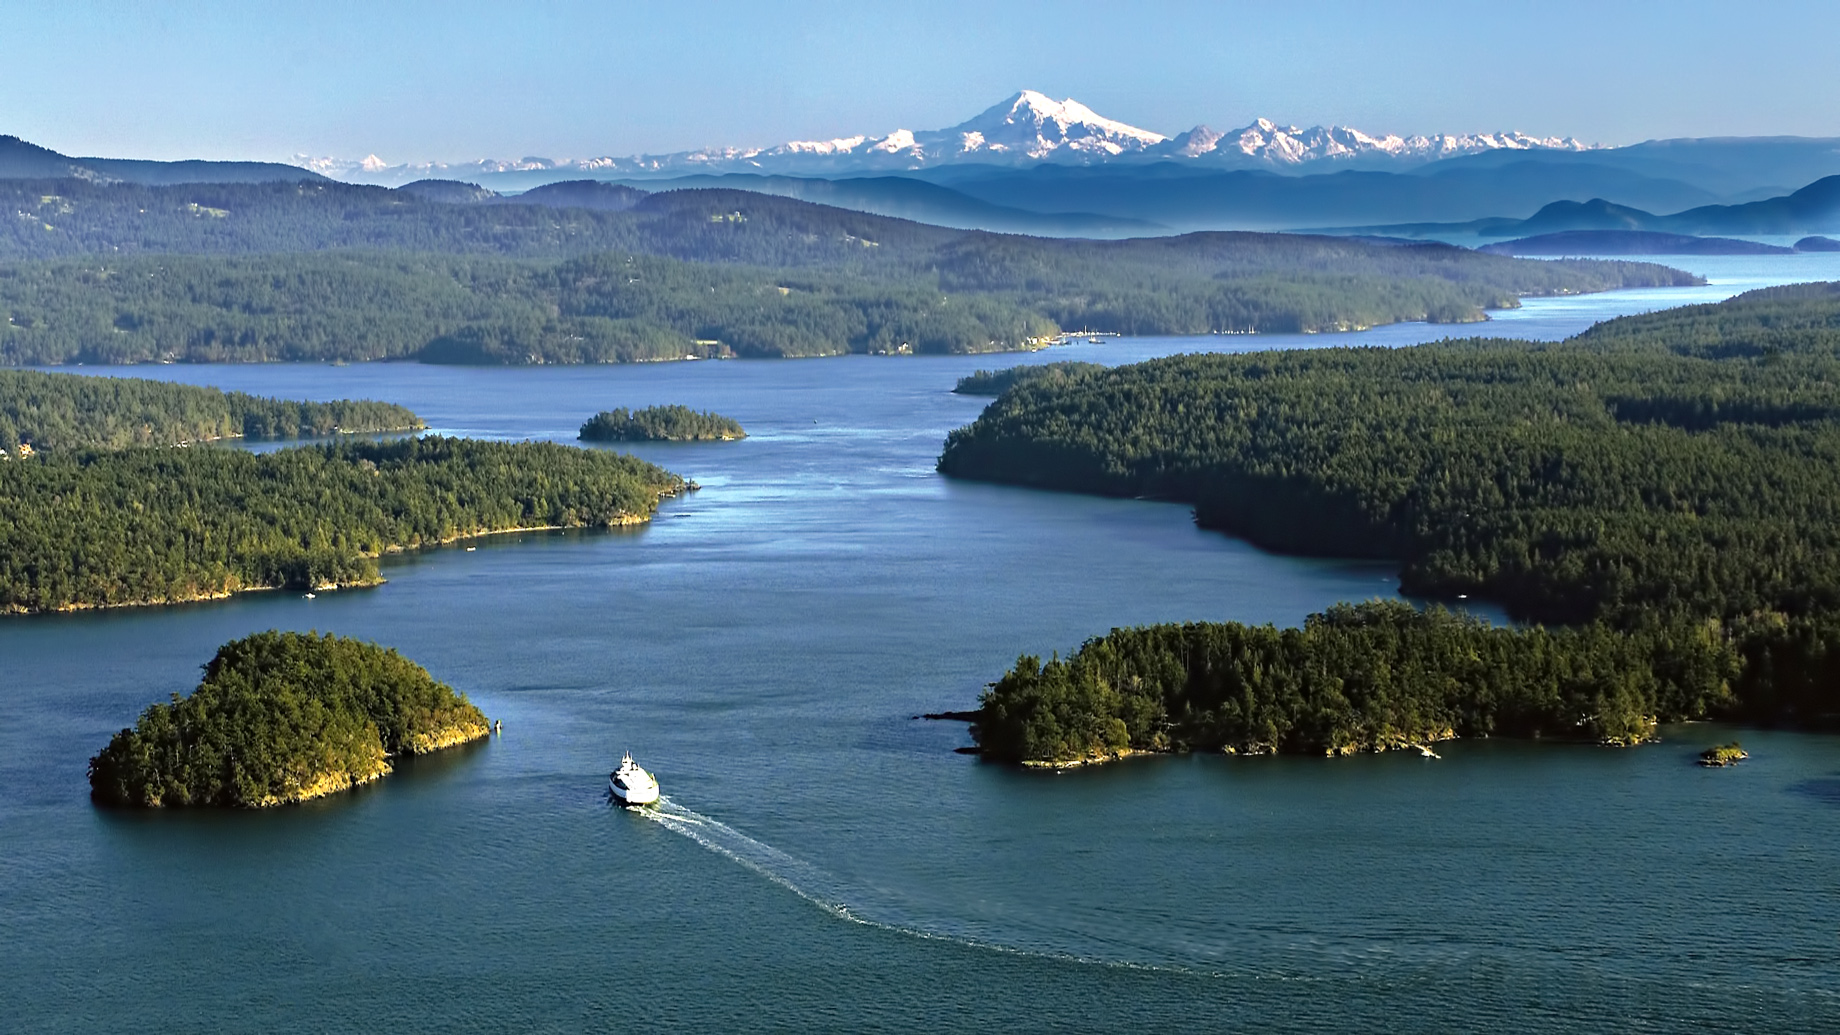 San Juan Islands - Washington, United States